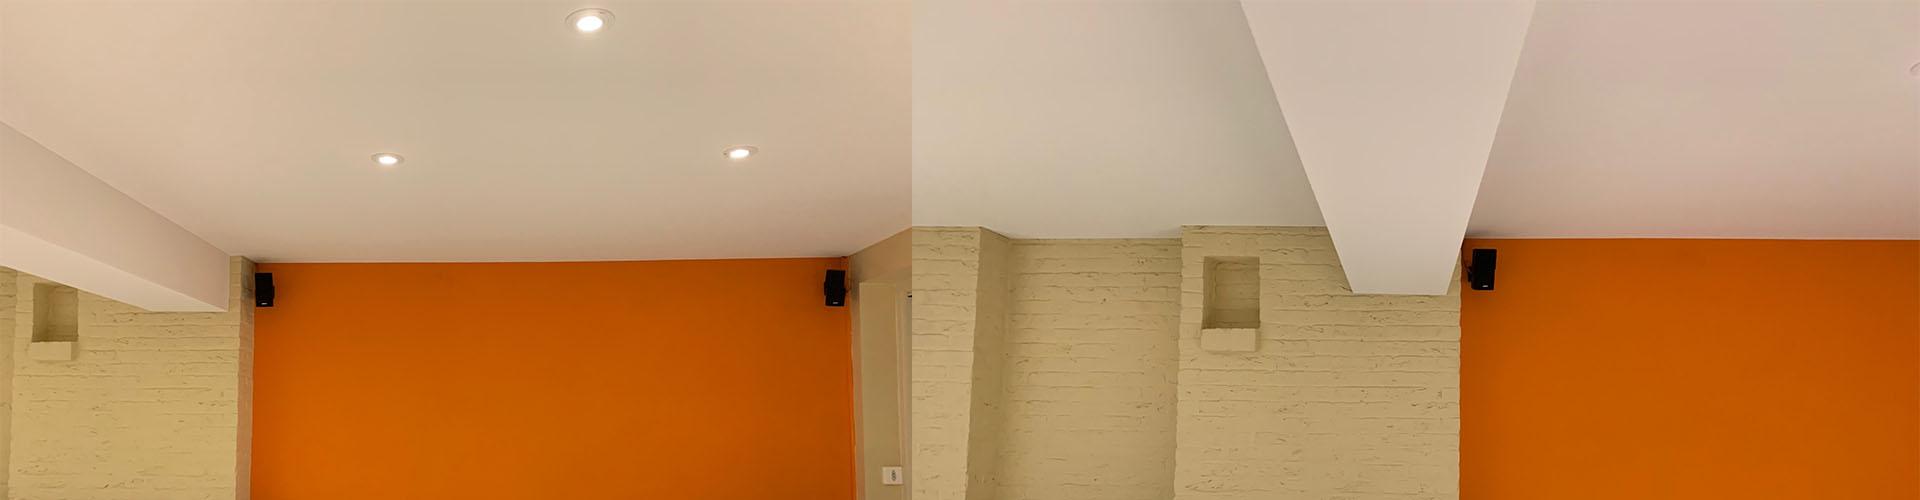 spanplafond06